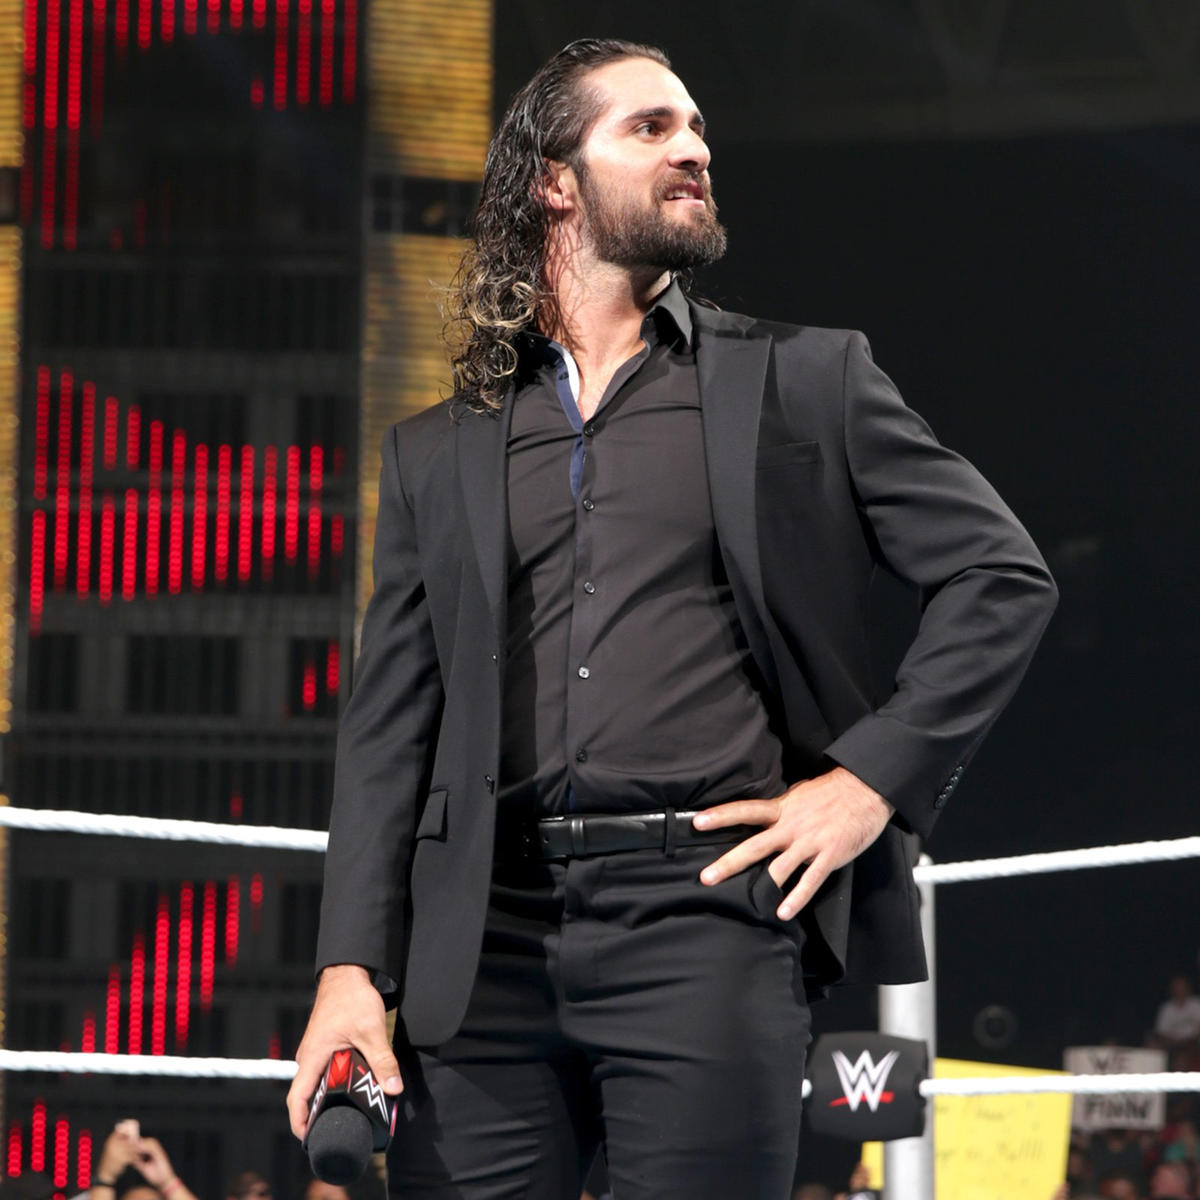 Seth Rollins Wearing His Shirt